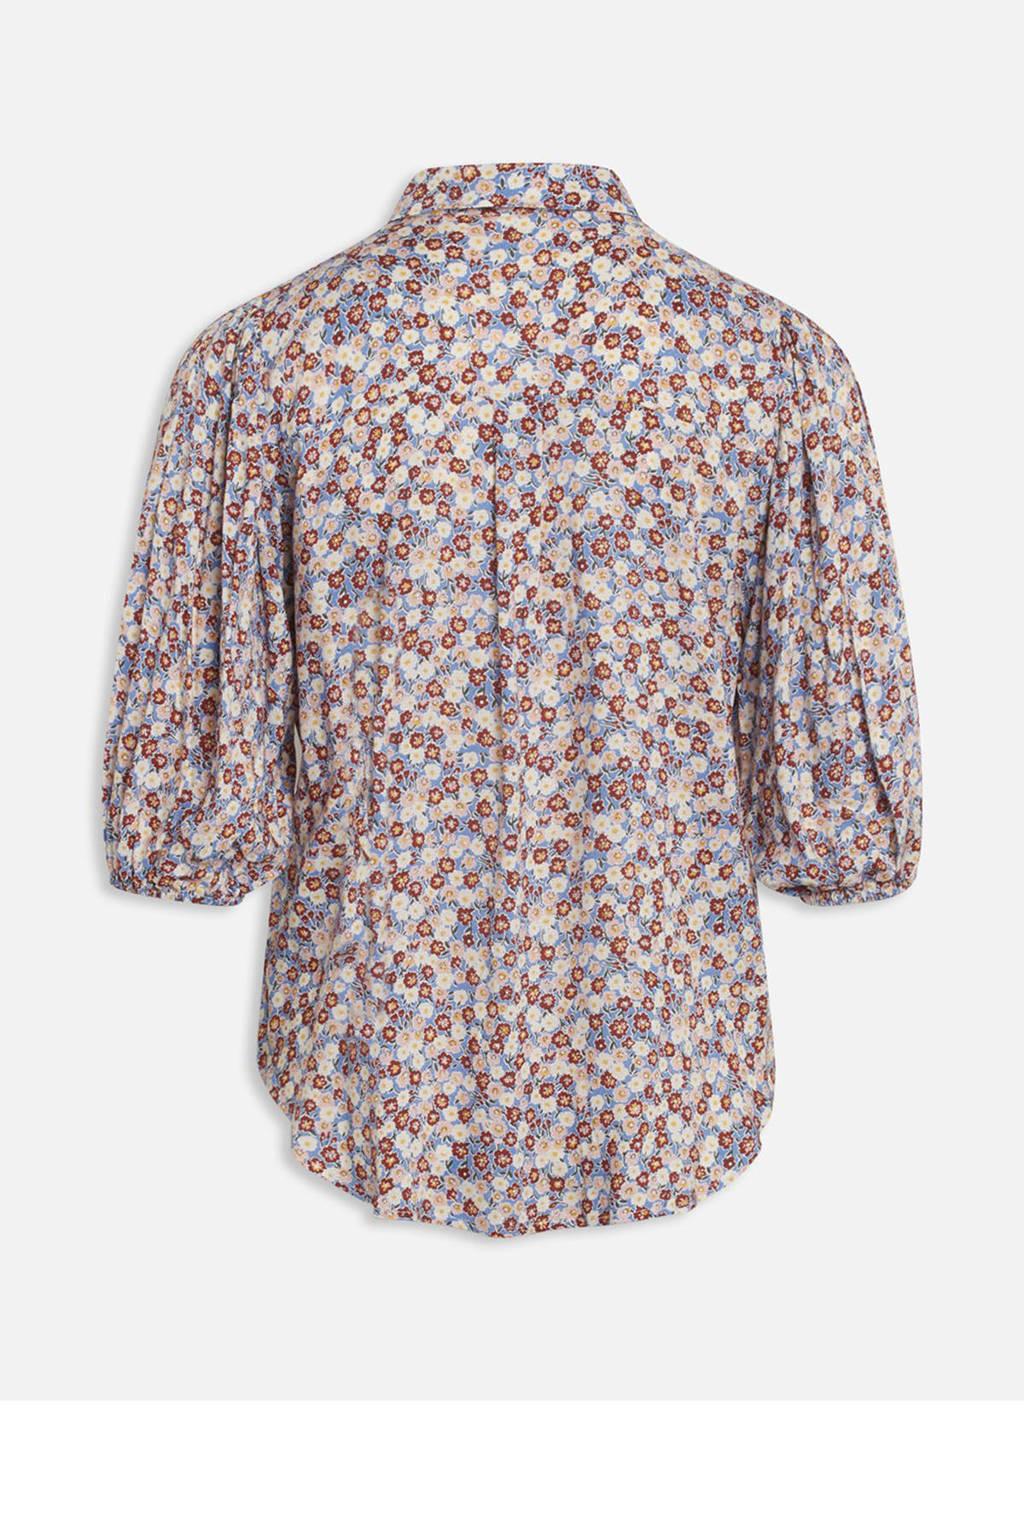 SisterS Point gebloemde blouse ELLA-SH3 blauw, Blauw